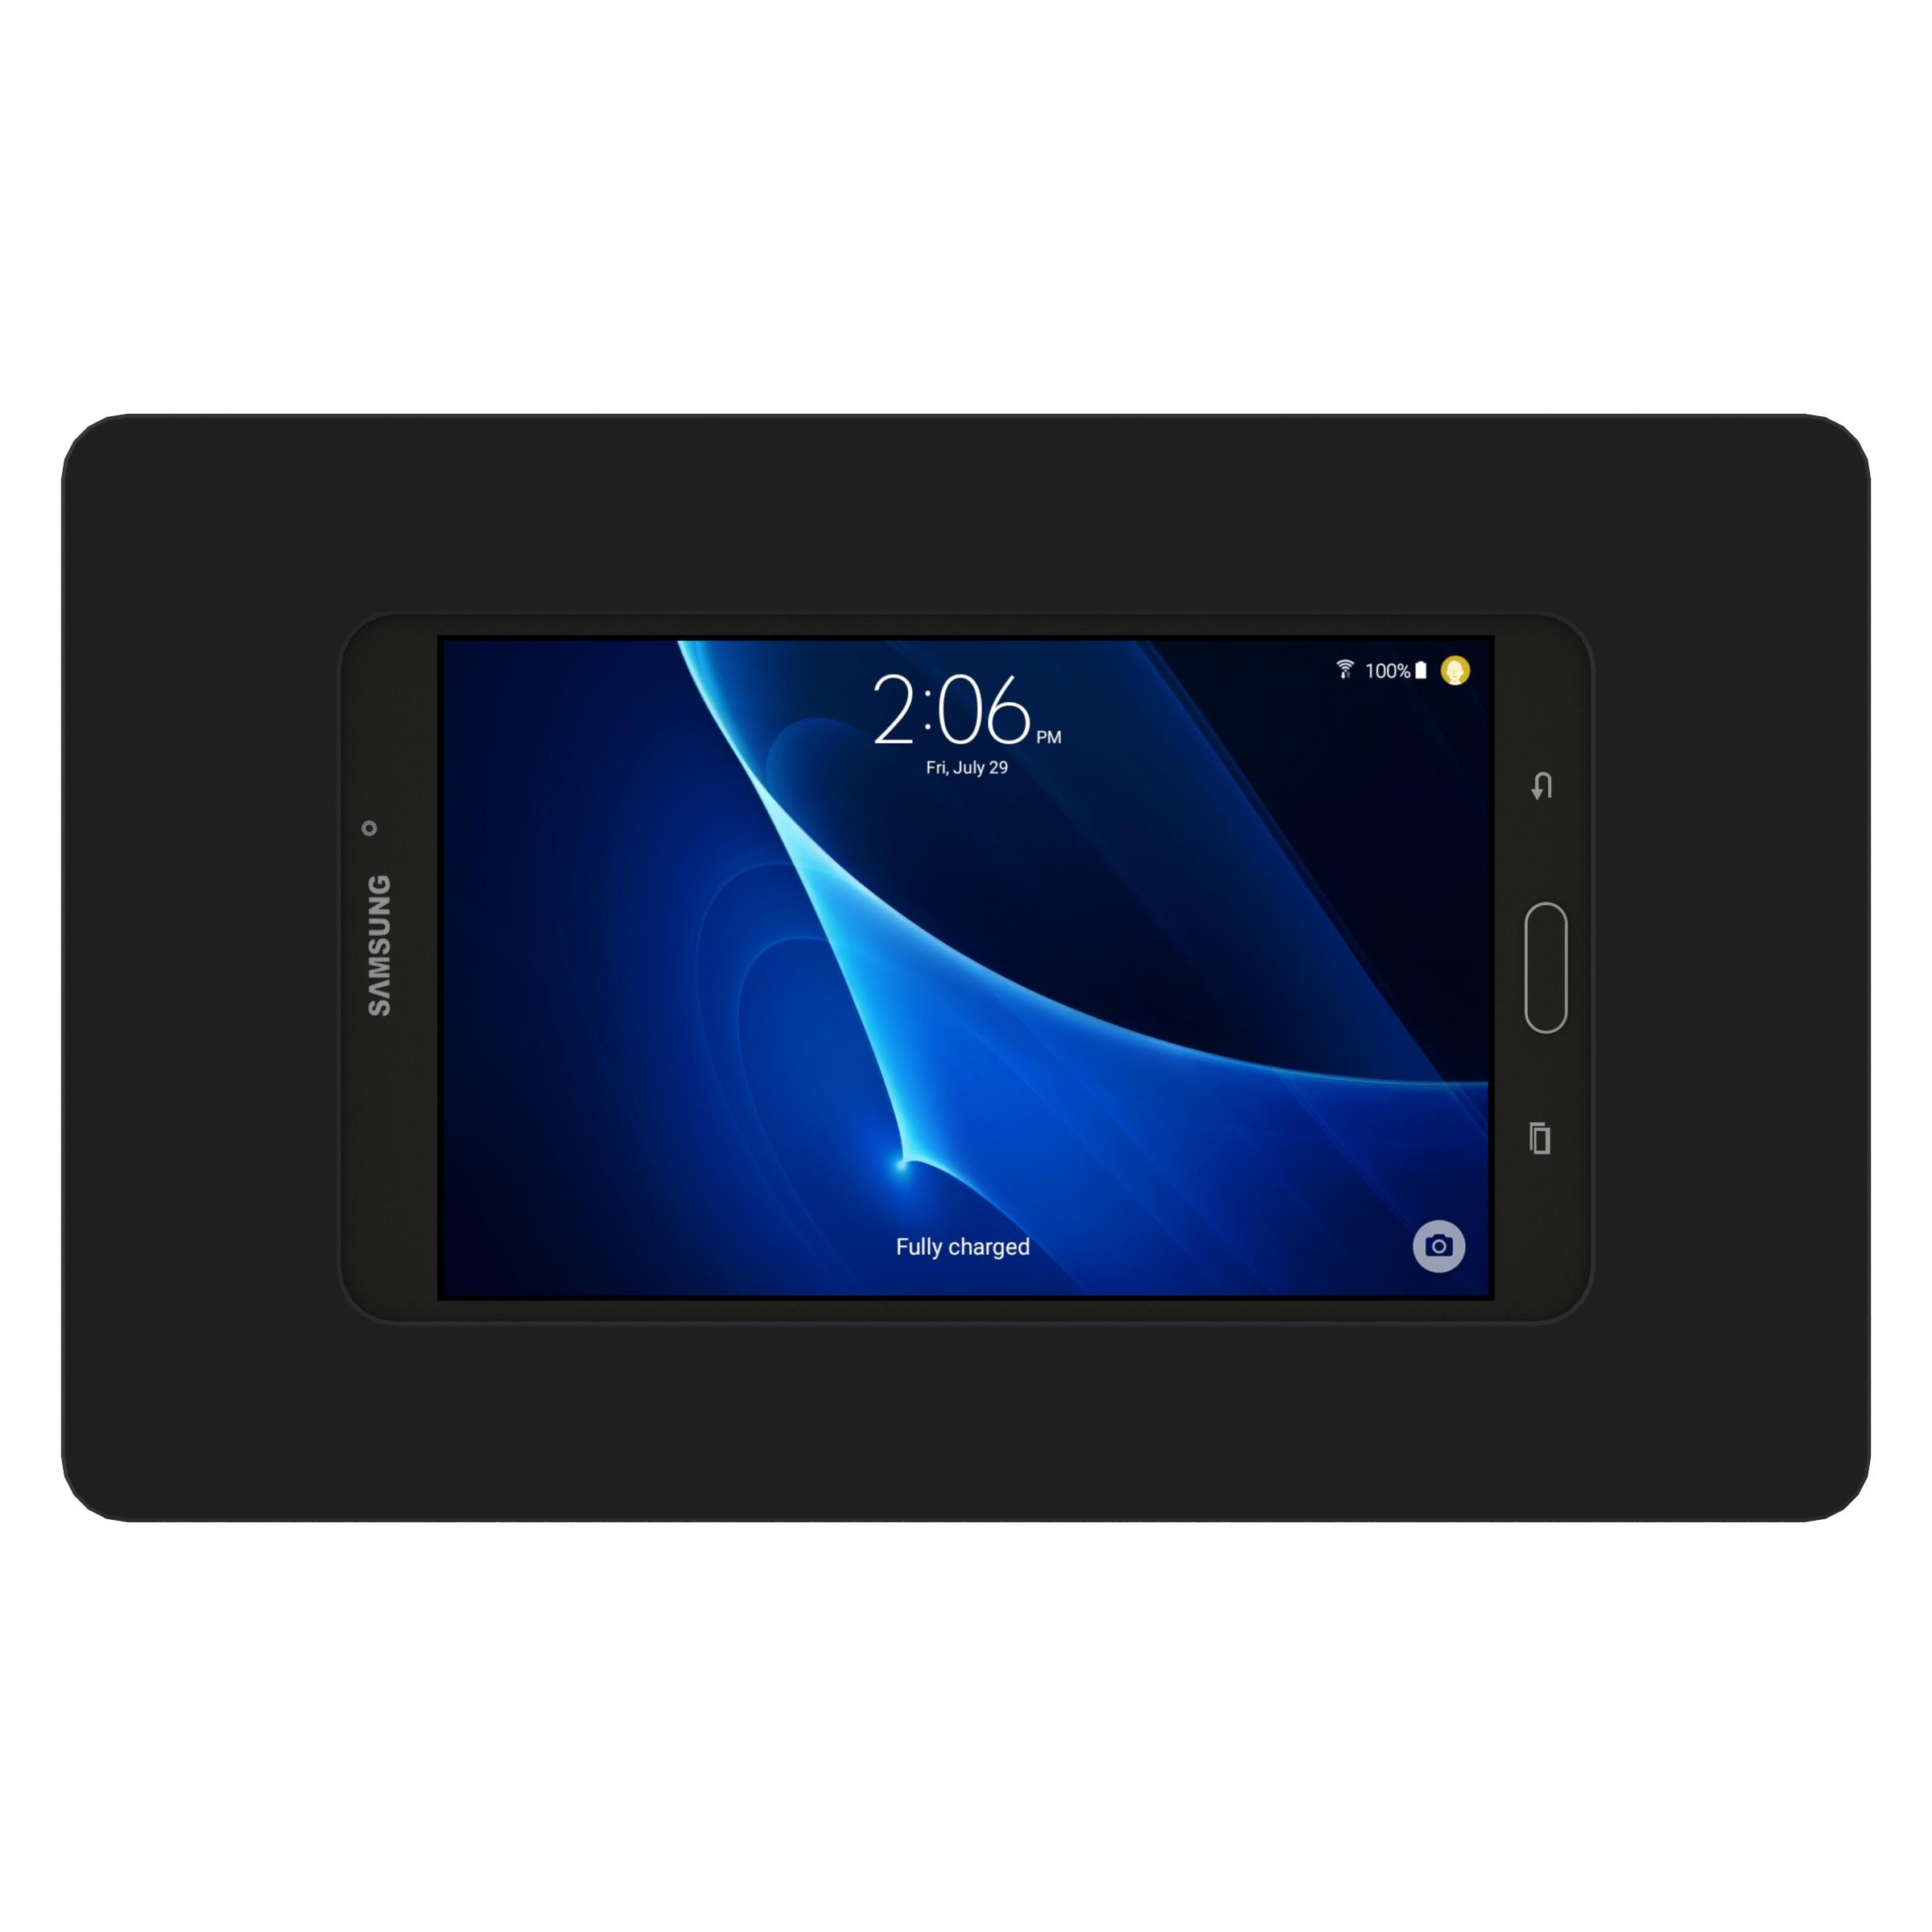 Black - Samsung Galaxy Tab A 7.0 - VidaMount On-Wall Tablet Mount